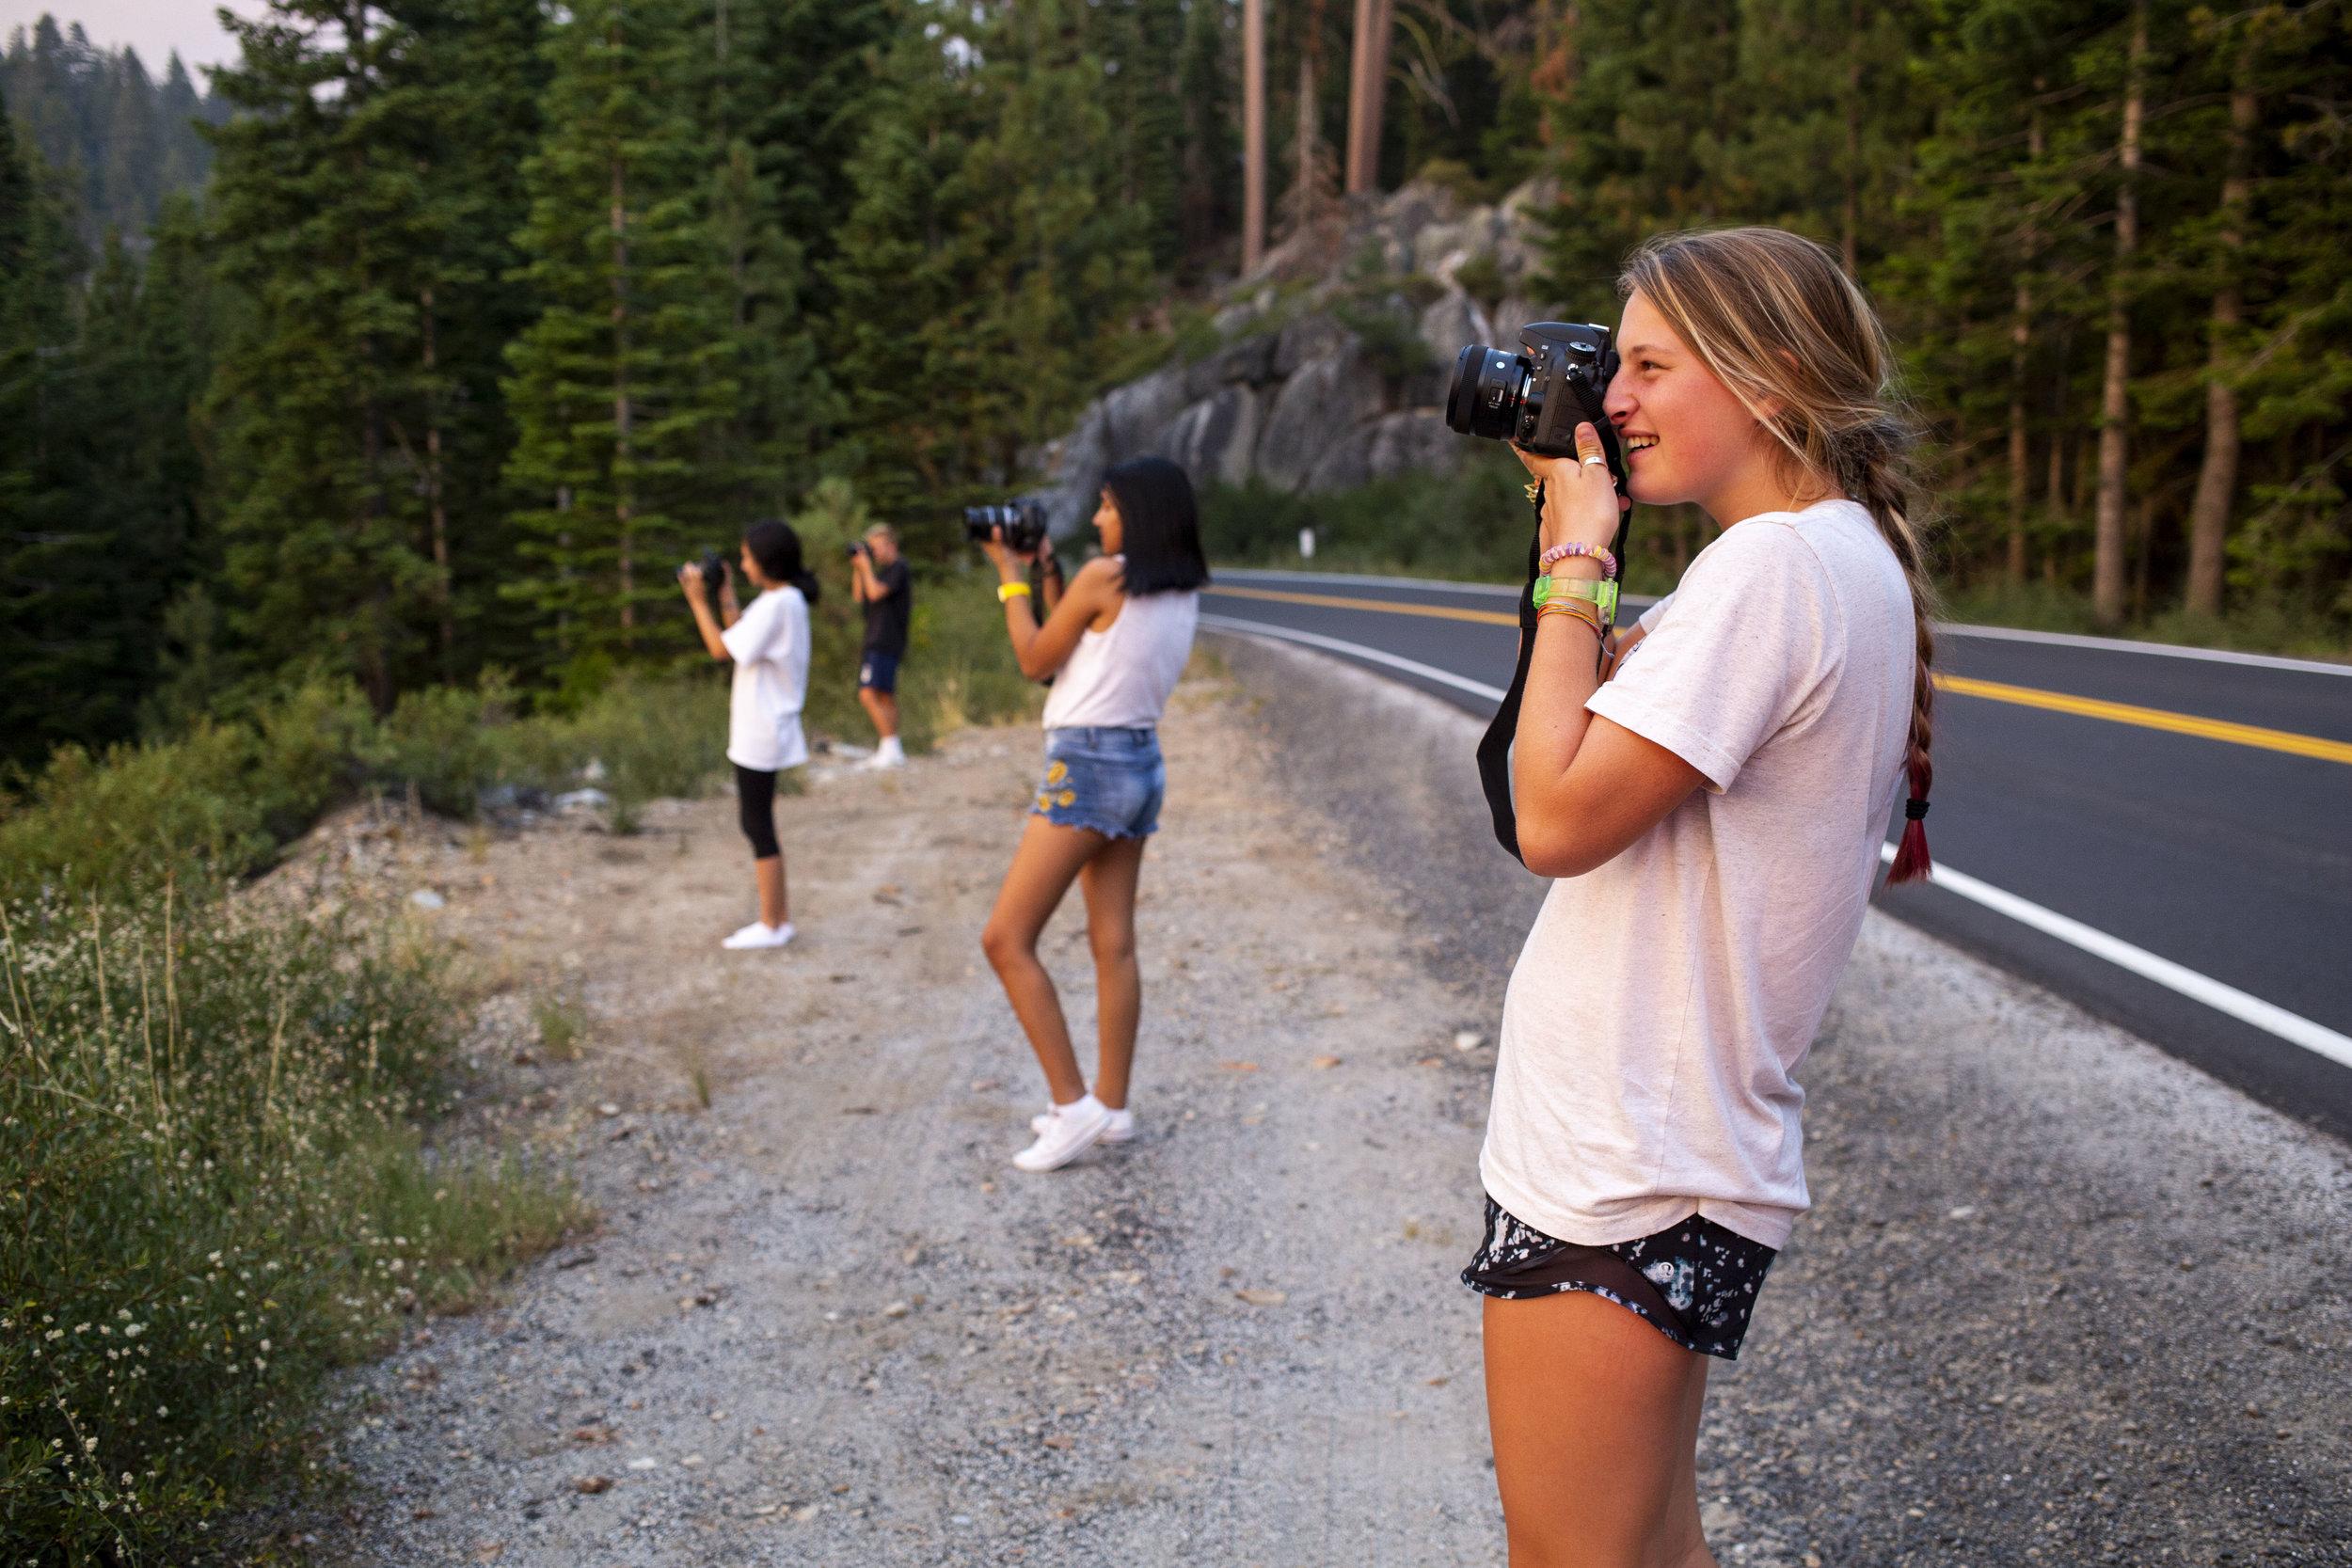 NGSE_Yosemite2018_AnnaLynch_3989.jpg